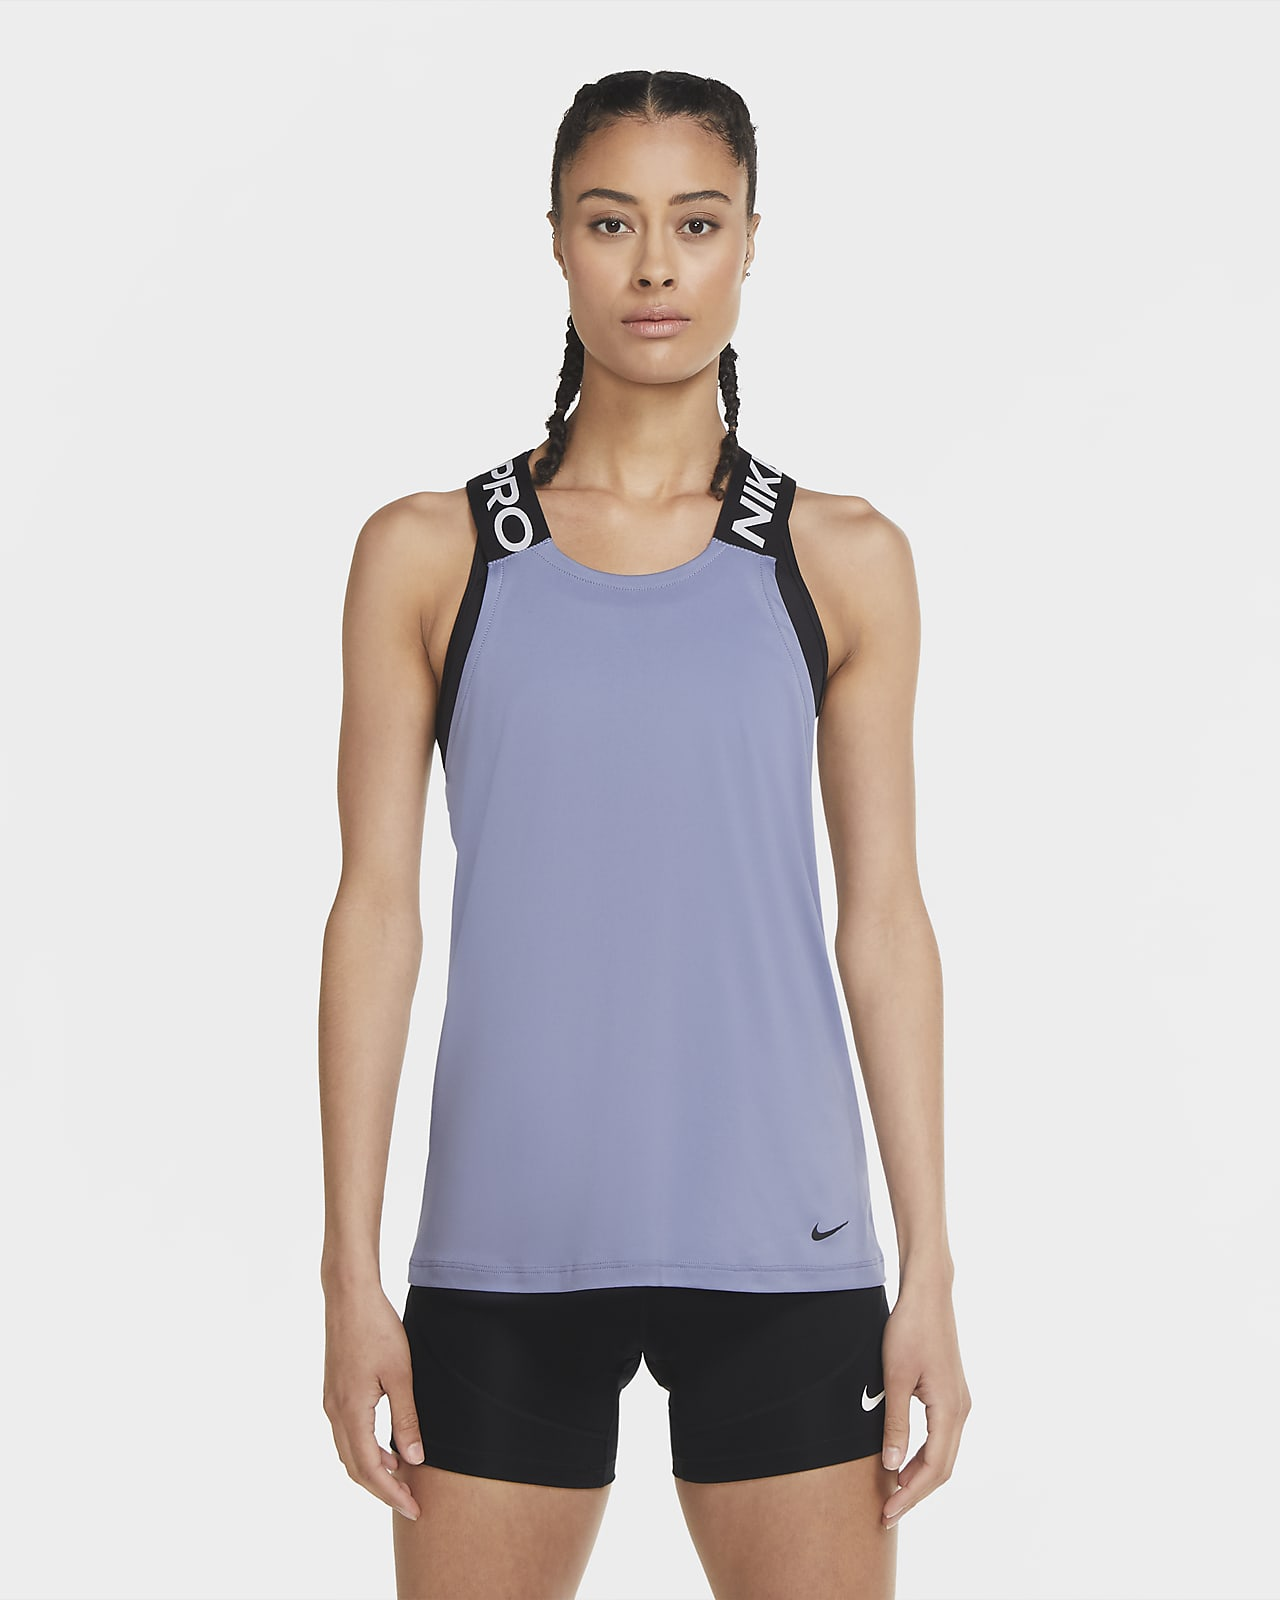 Dámské tílko Nike Pro